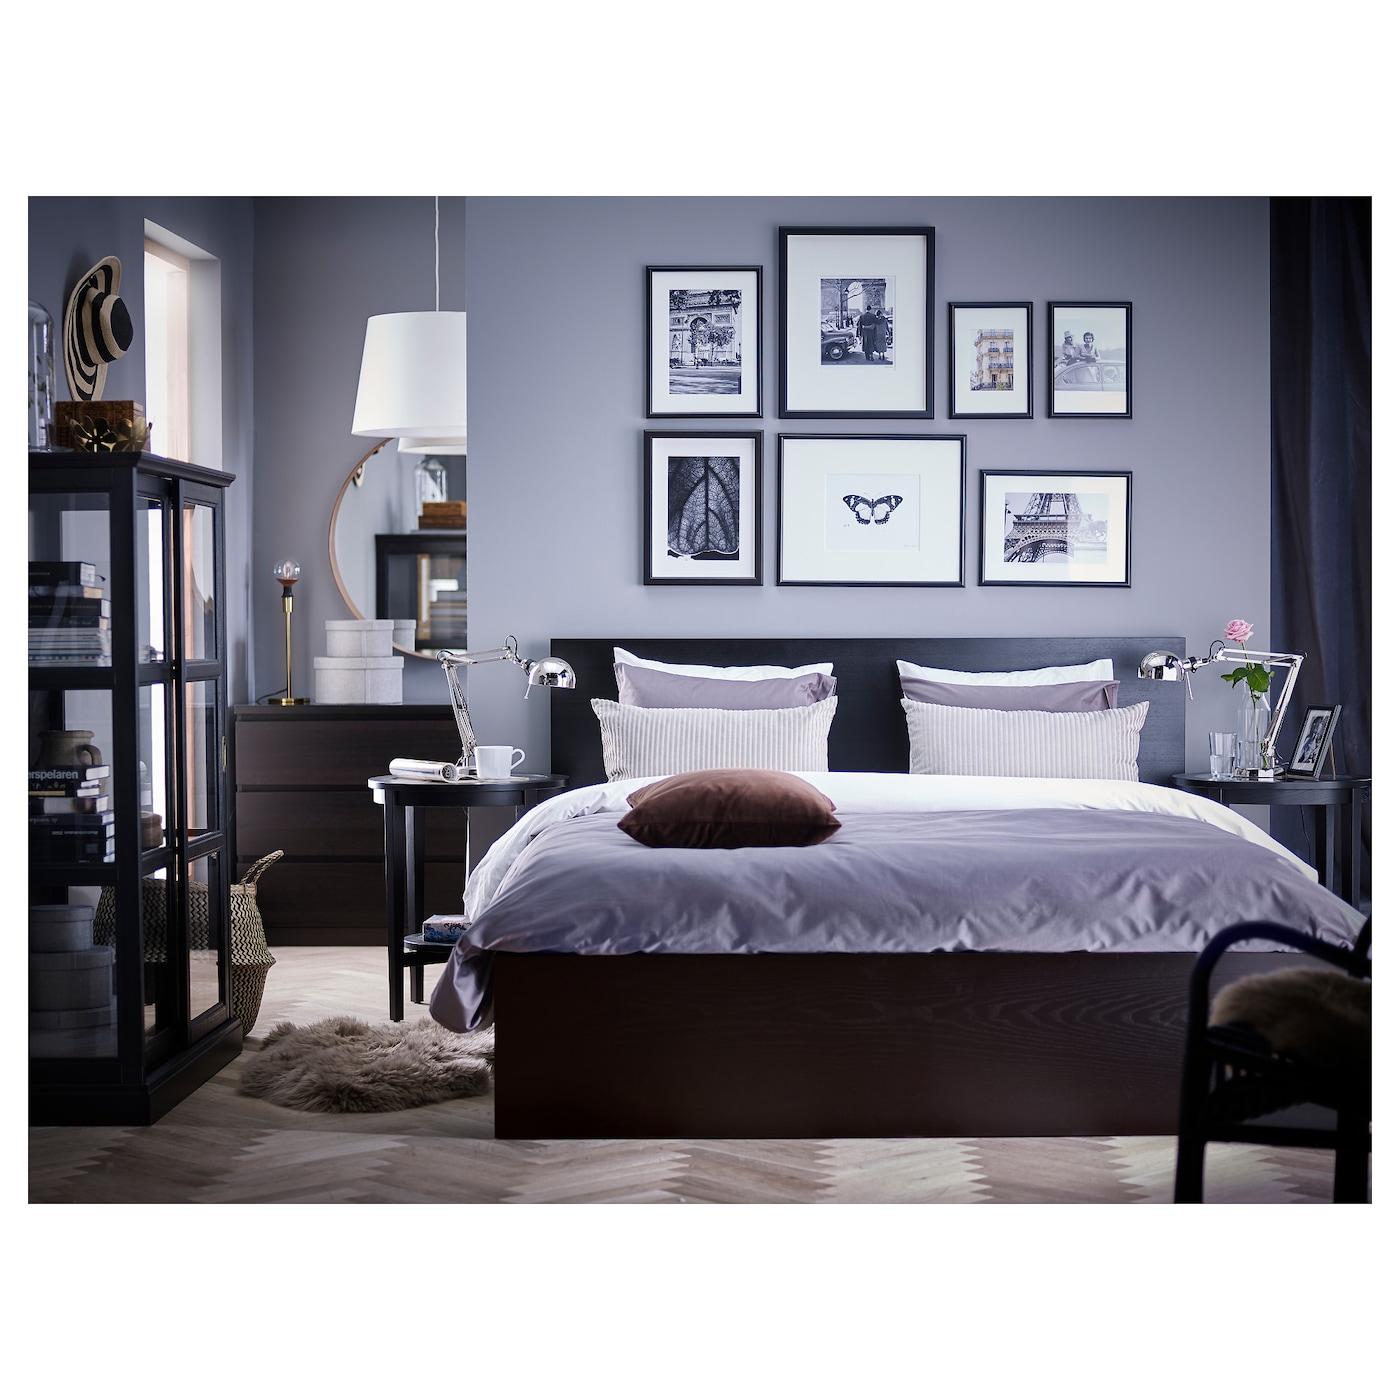 Malm estructura de cama alta negro marr n l nset 160 x 200 cm ikea - Ikea cama alta ...